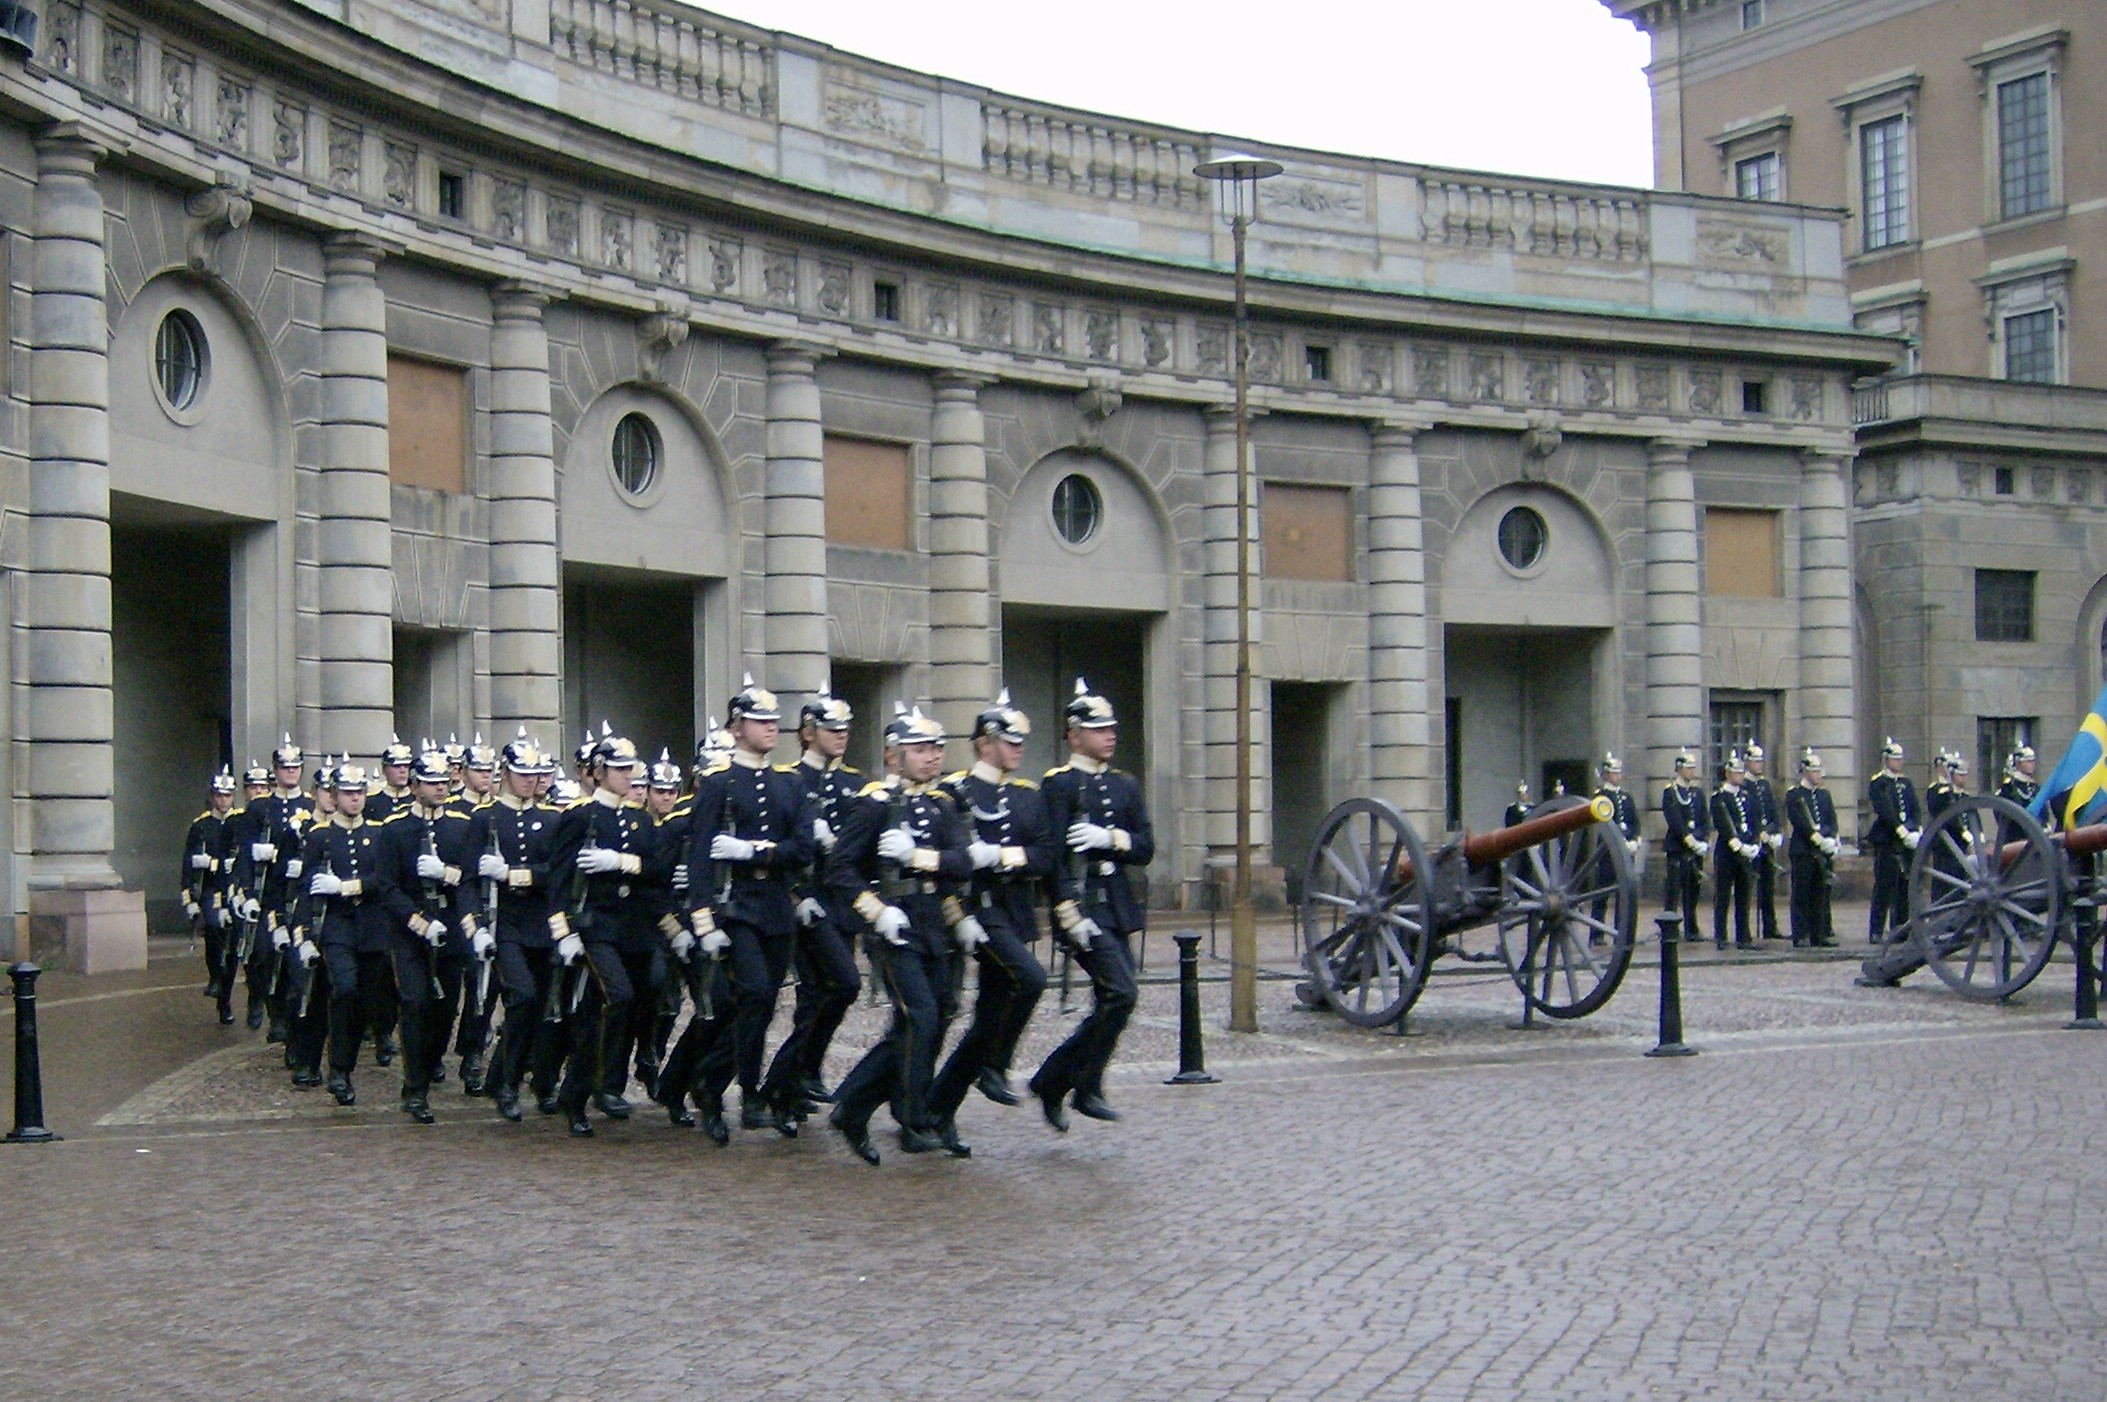 Military step - Wikipedia e65f3a13445f3